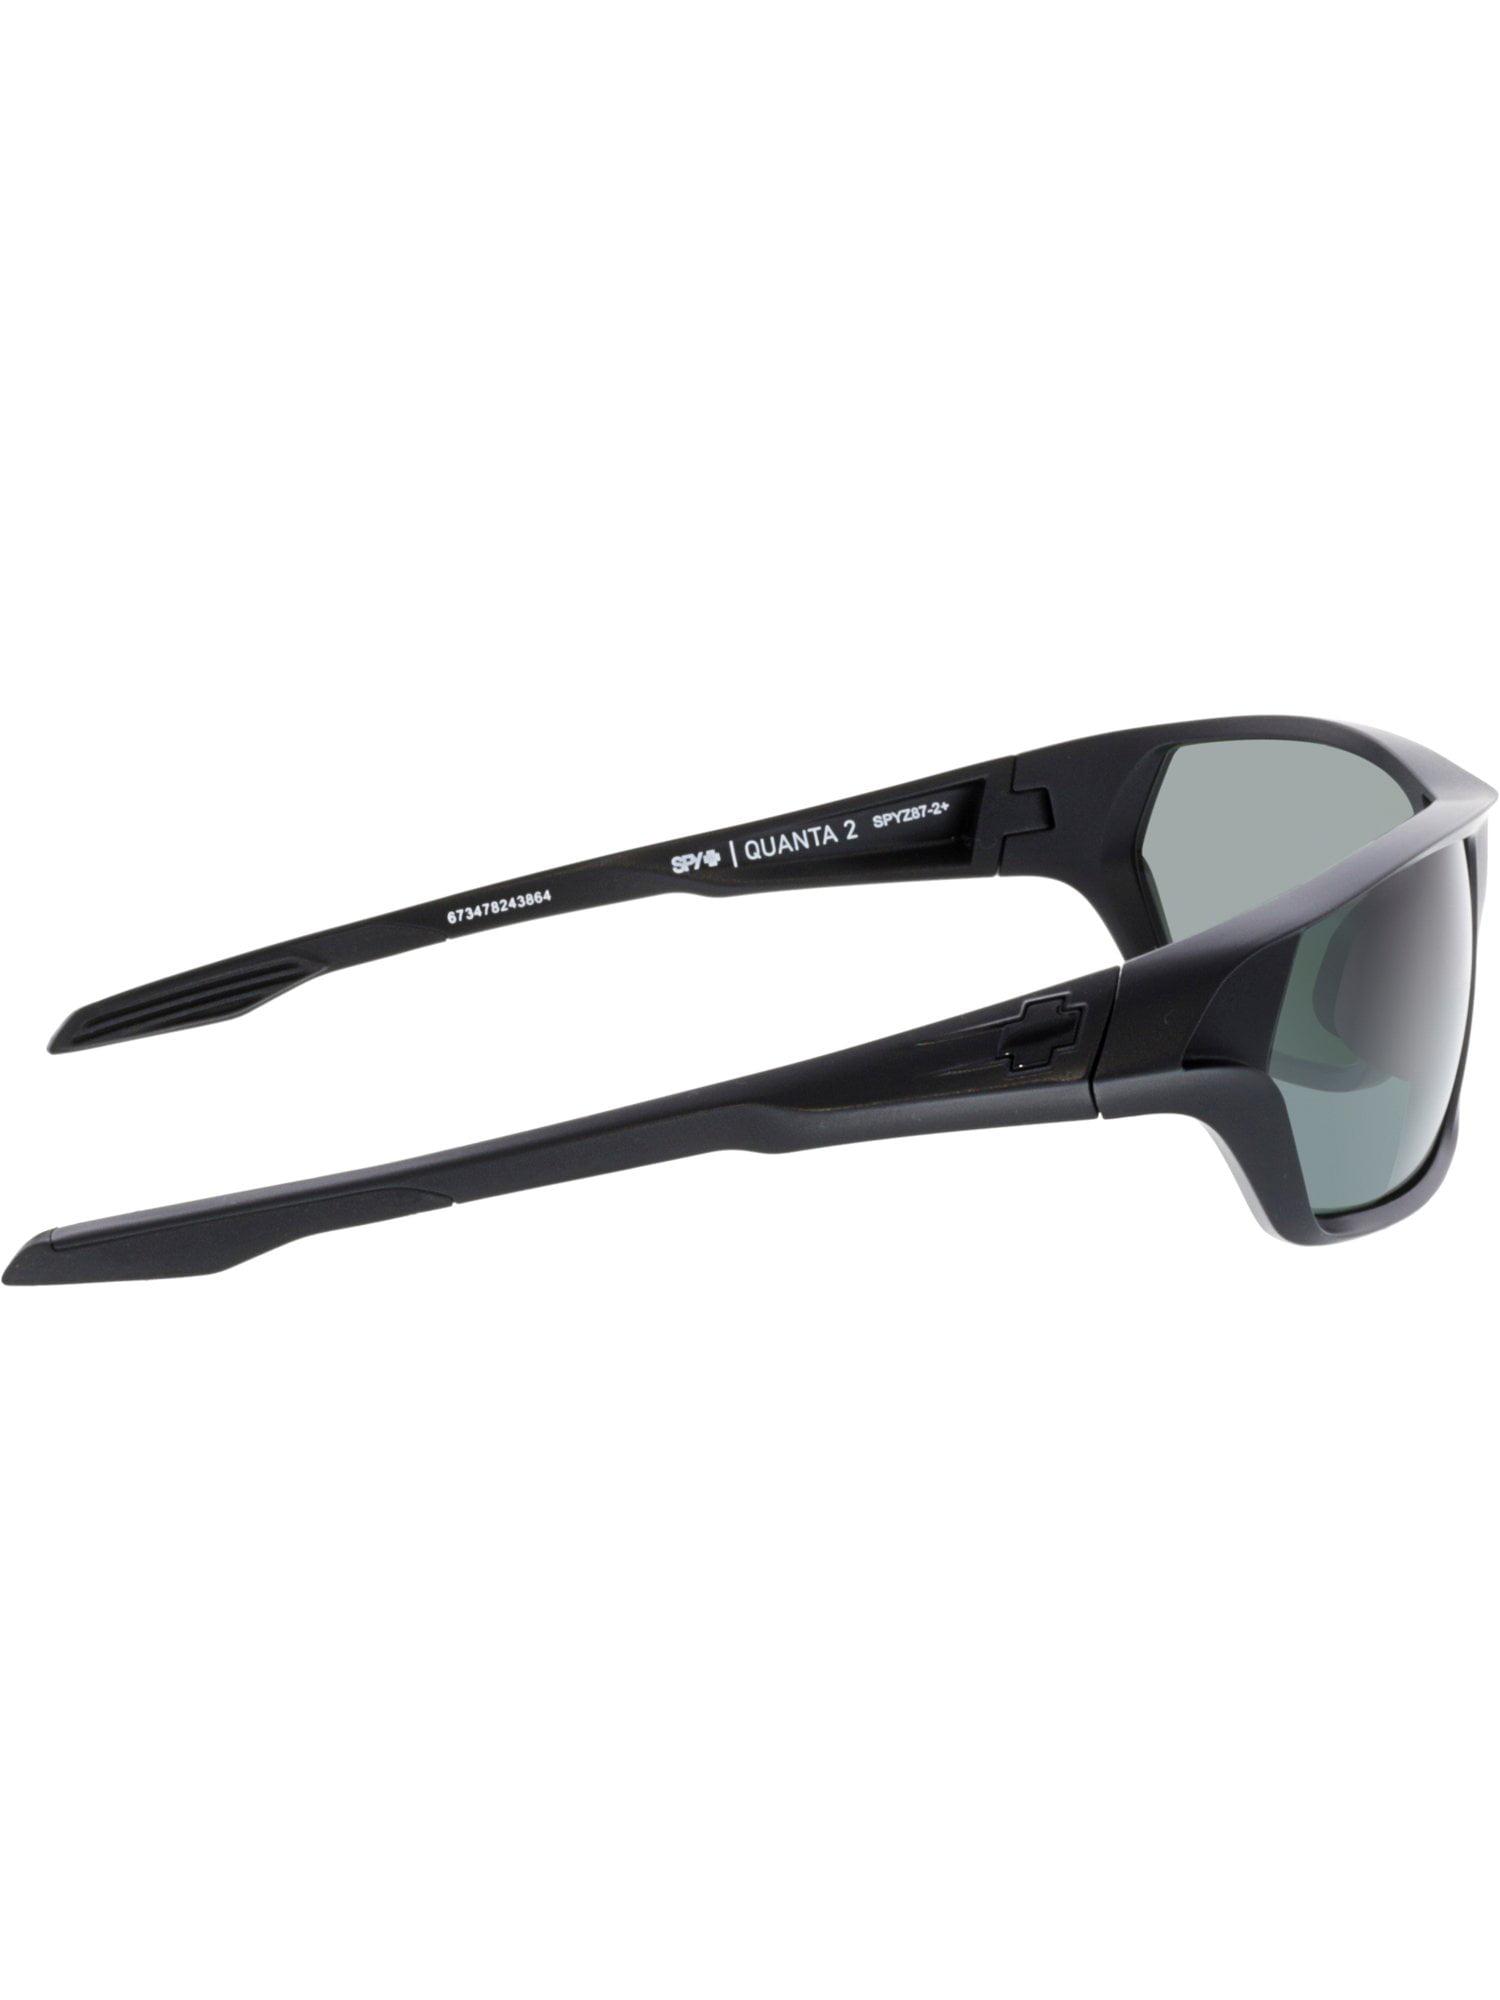 7cc3808422b Spy - Spy Men s Polarized Ansi 673478243864 Black Rectangle Sunglasses -  Walmart.com